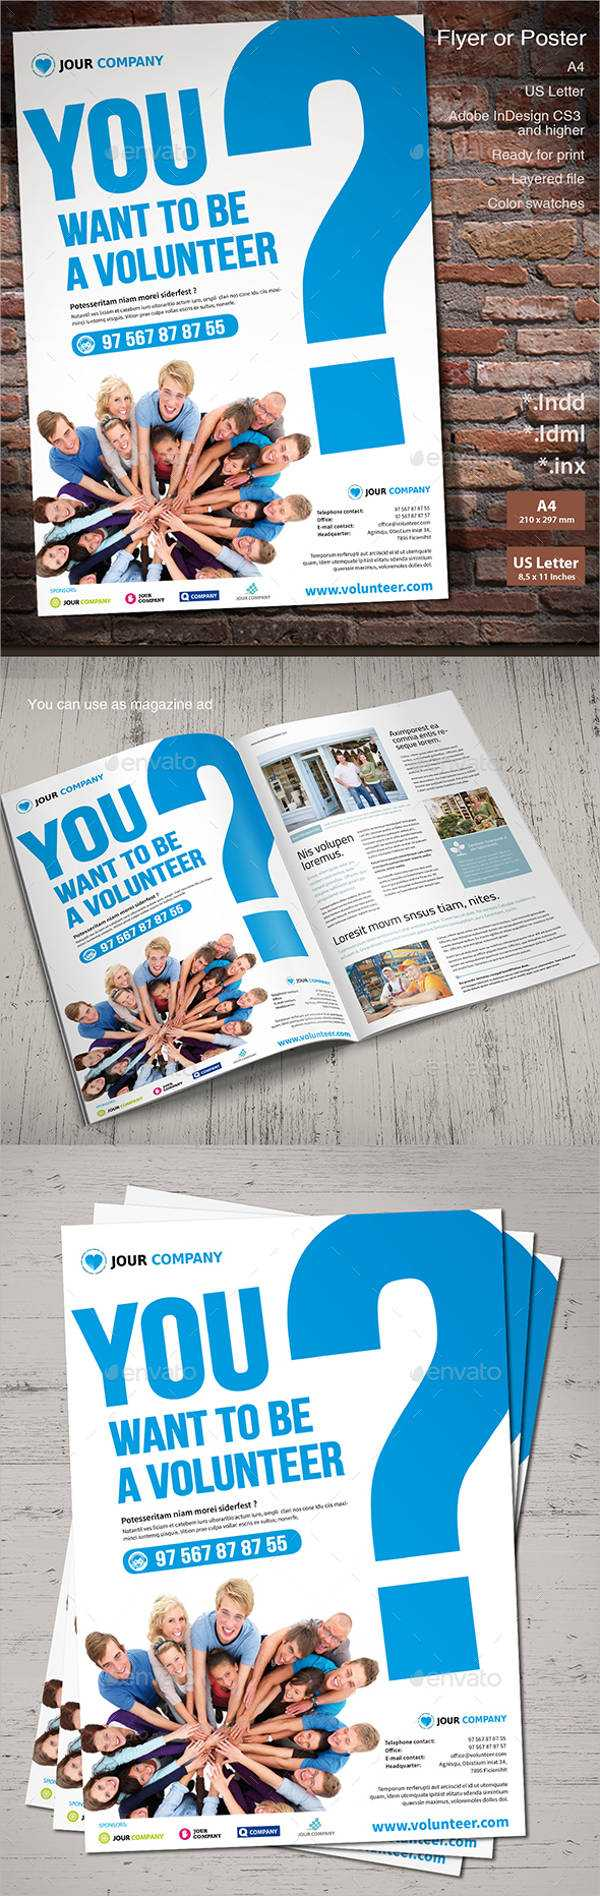 11+ Volunteer Flyers - Ms Word, Pages, Psd, Vector Eps Intended For Volunteer Brochure Template